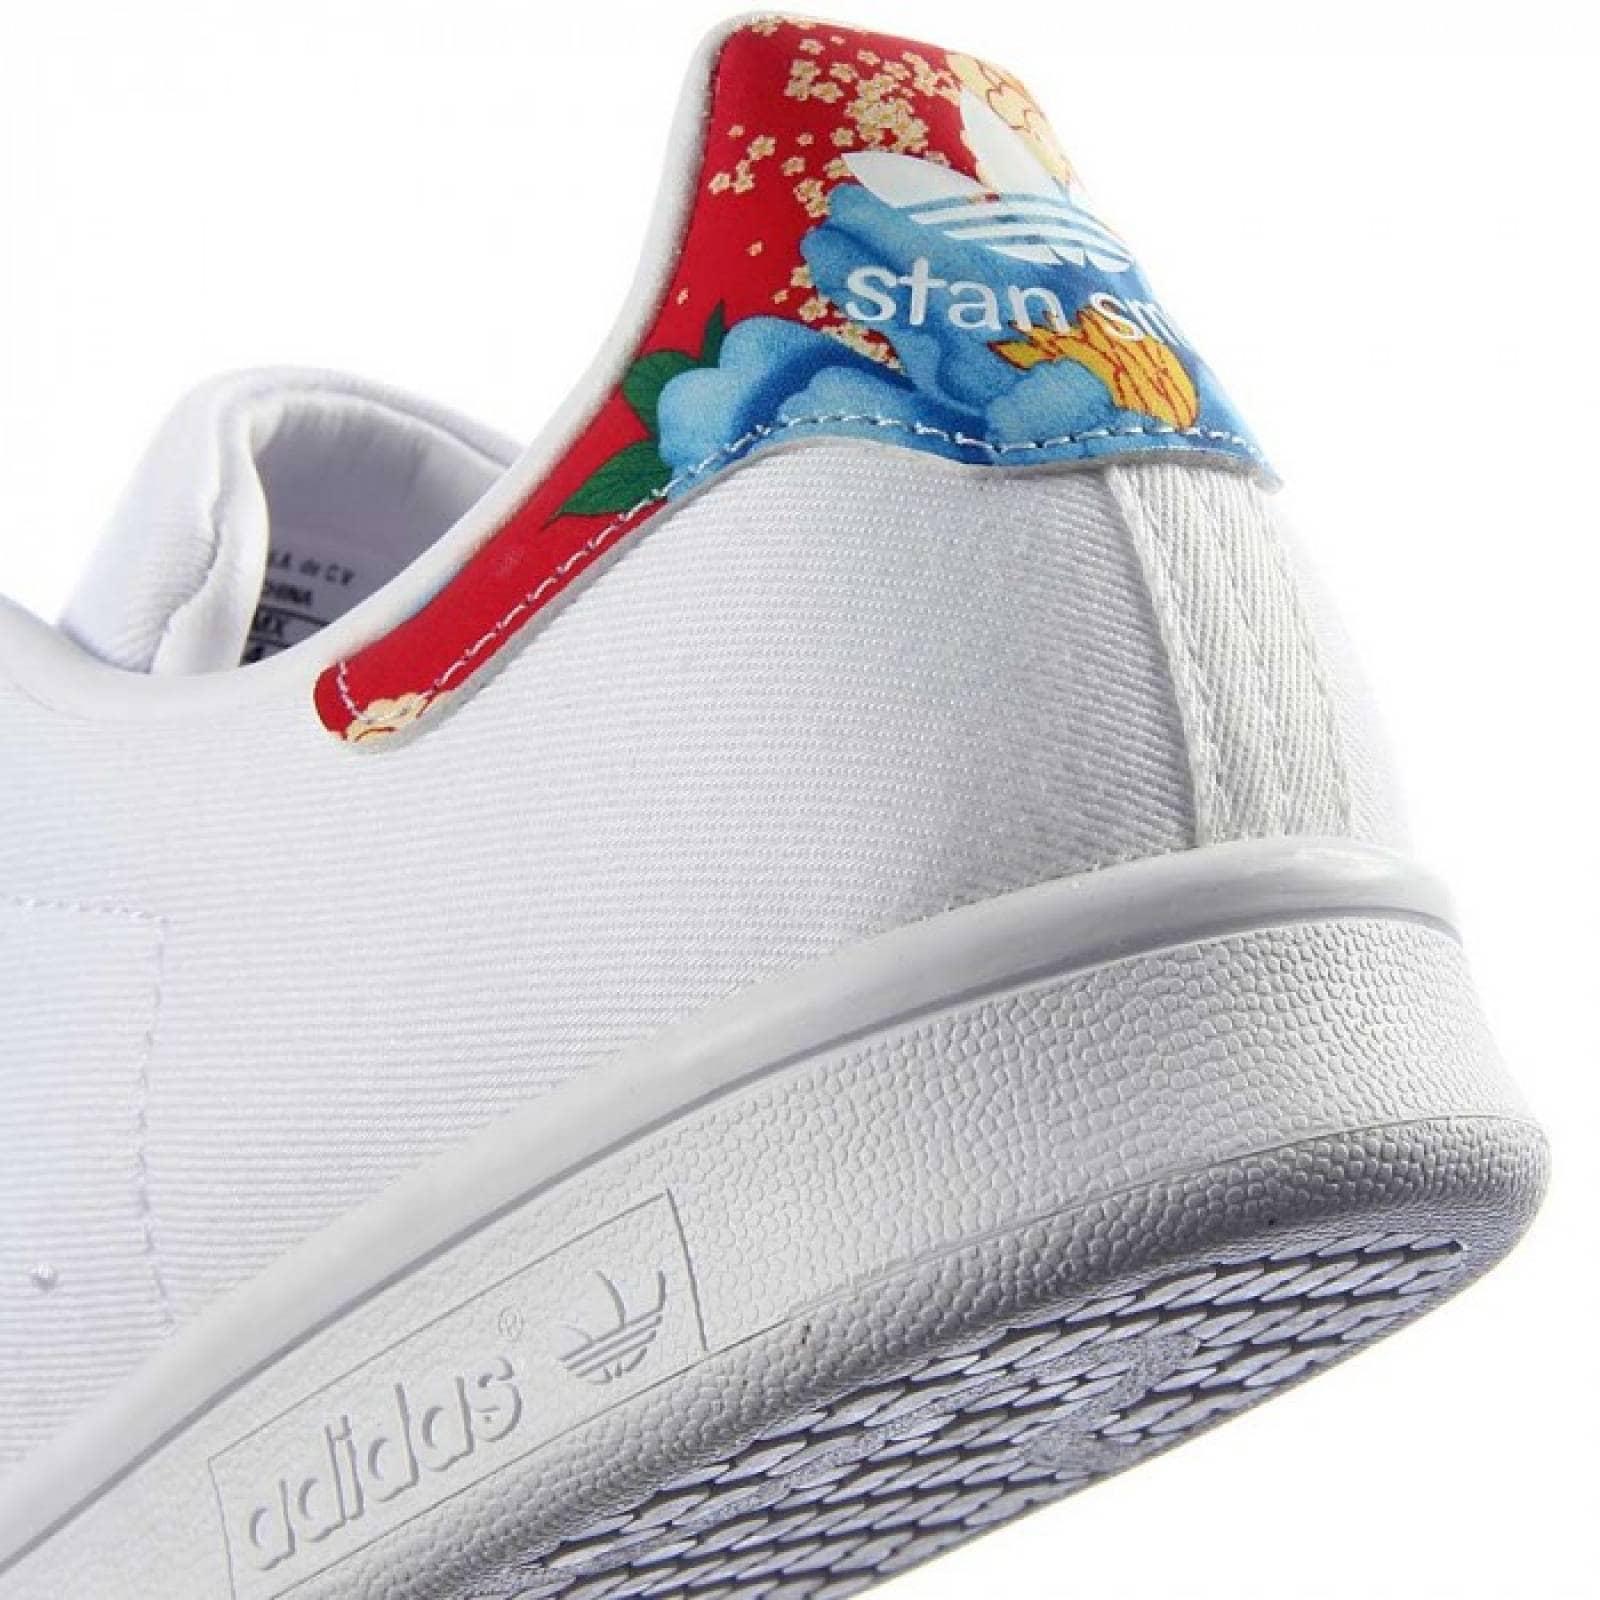 release date: c66e8 08795 Tenis adidas stan smith originals mujer blanco flores